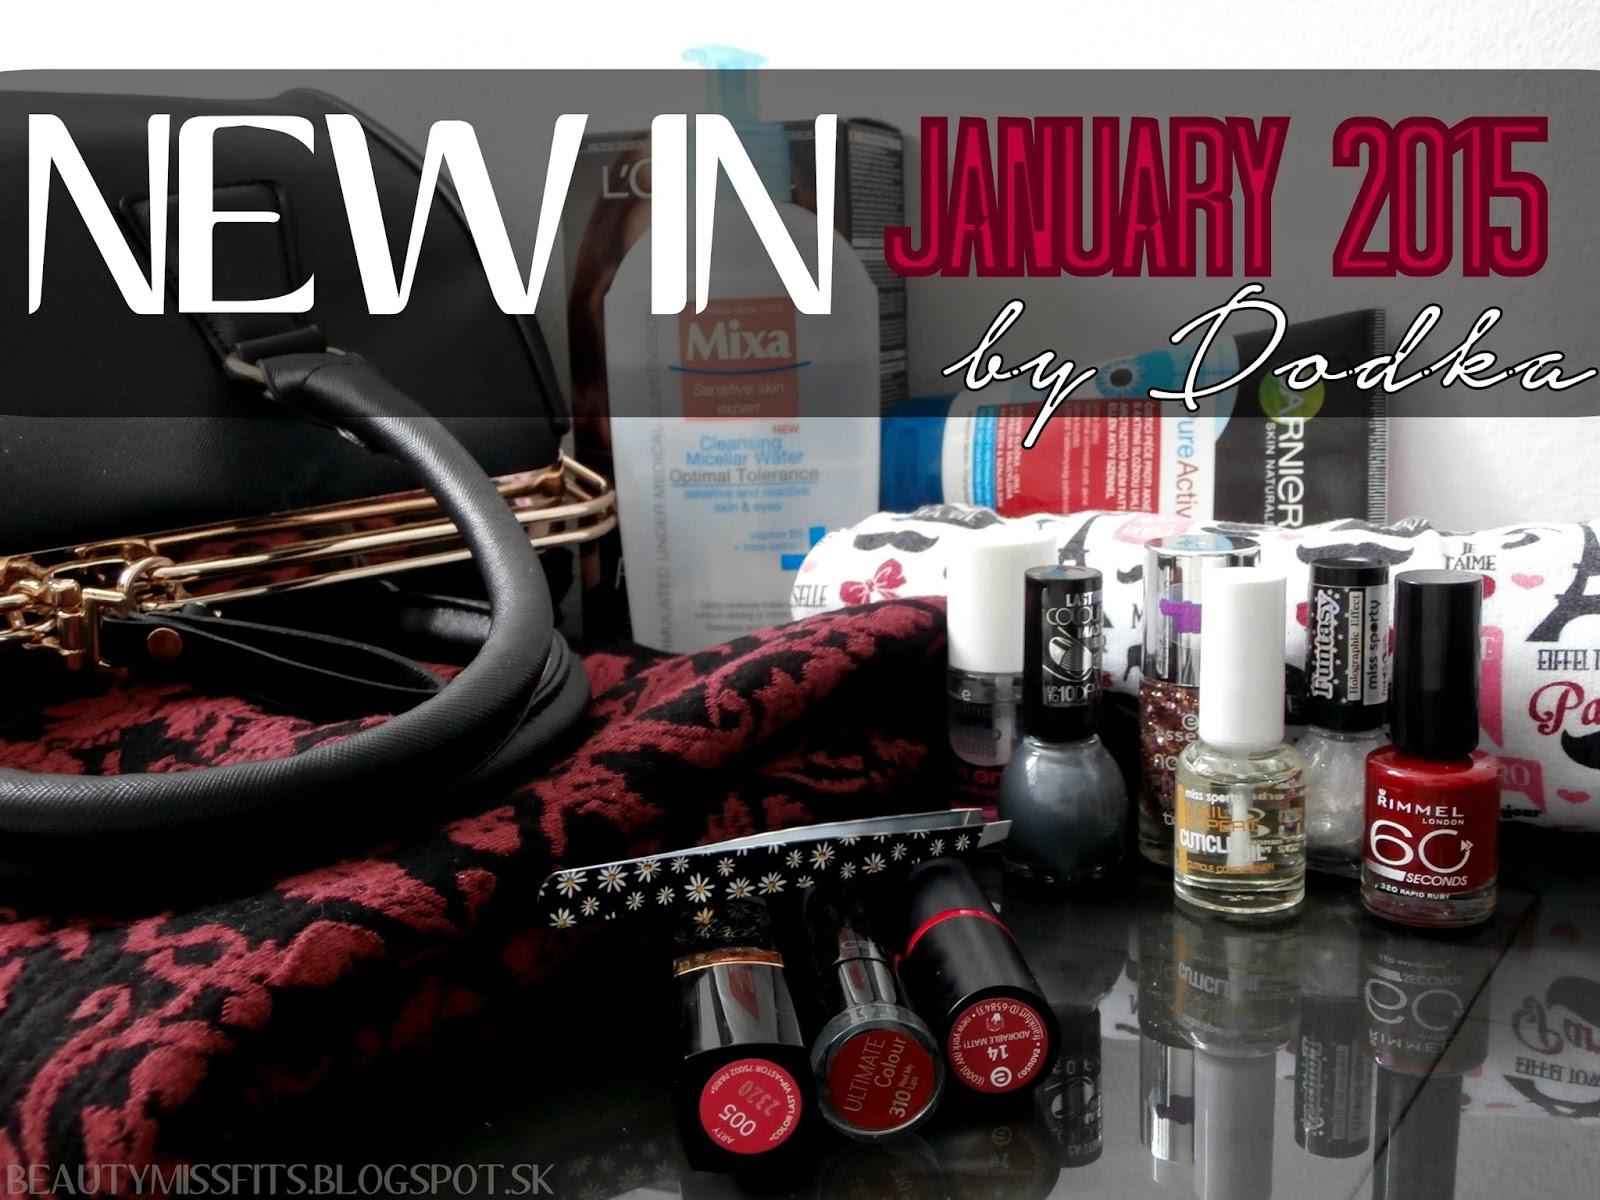 NEW IN - Január 2015 (by Dodka)